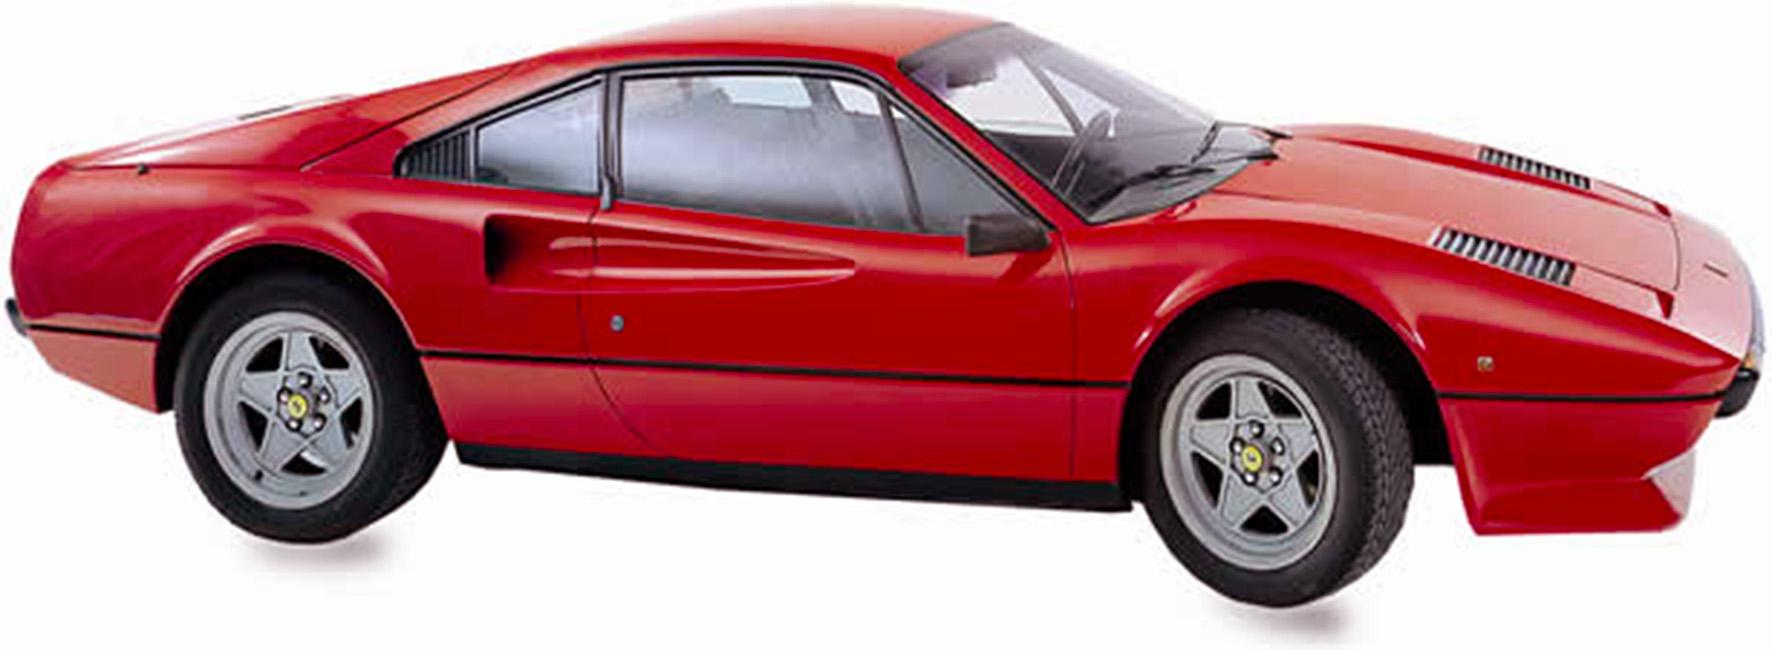 La Ferrari '308' GTB carburatori, 1980, disegnata da Leonardo Fioravanti, per Pininfarina, foto © aut./MAUTO